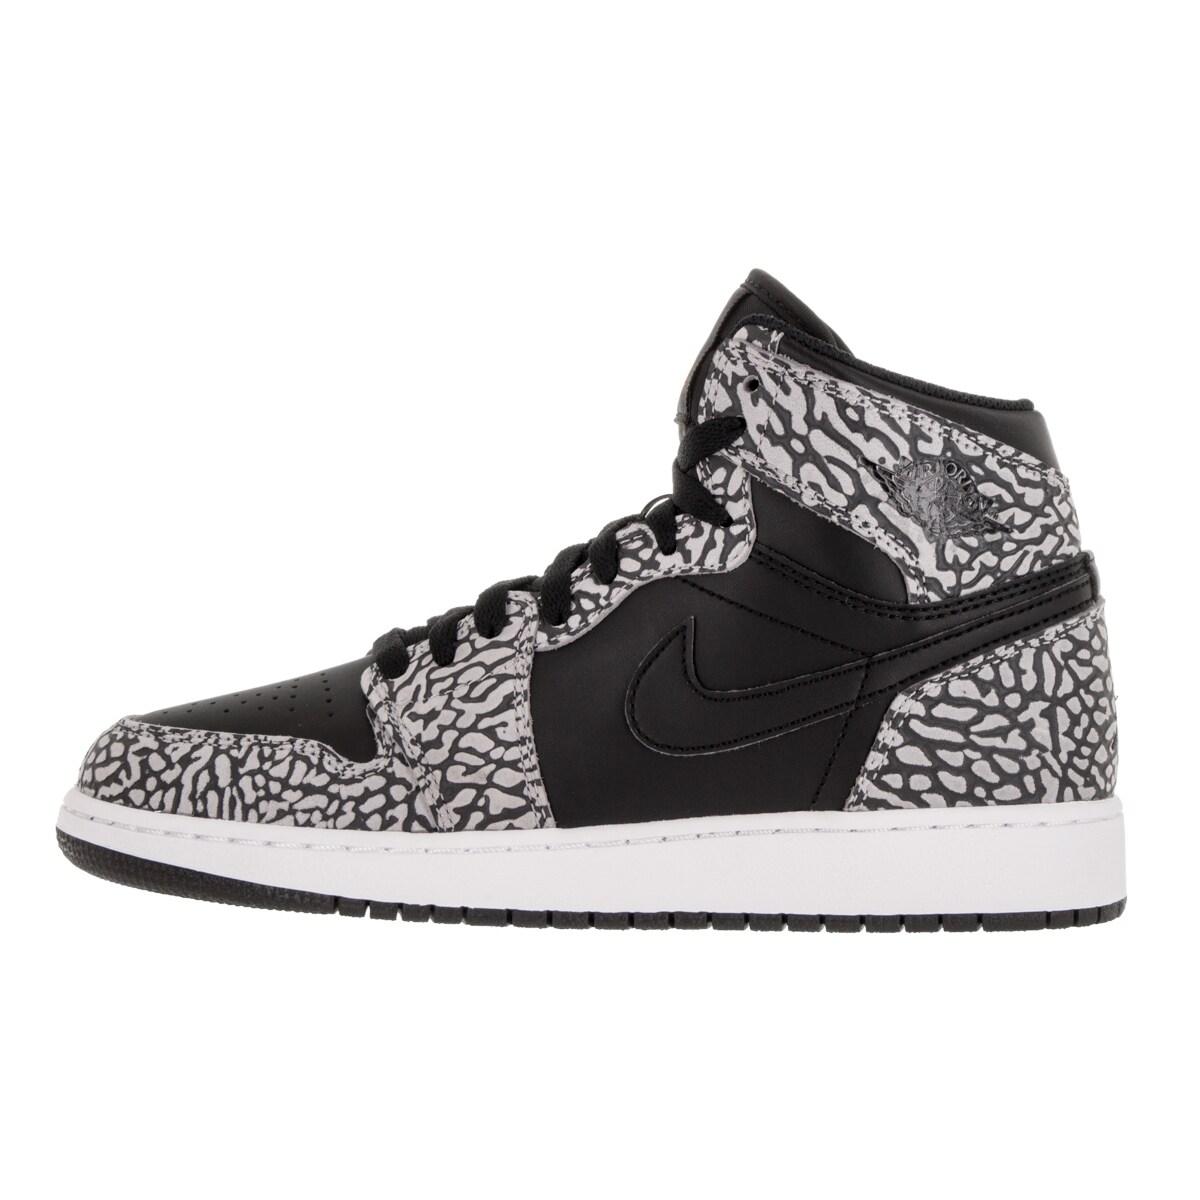 outlet store 145b4 a812d Shop Nike Jordan Kids Air Jordan 1 Retro Hi Prem Bg Black Gym Red CMint   Anthracite Basketball Shoe - Free Shipping Today - Overstock - 12346733